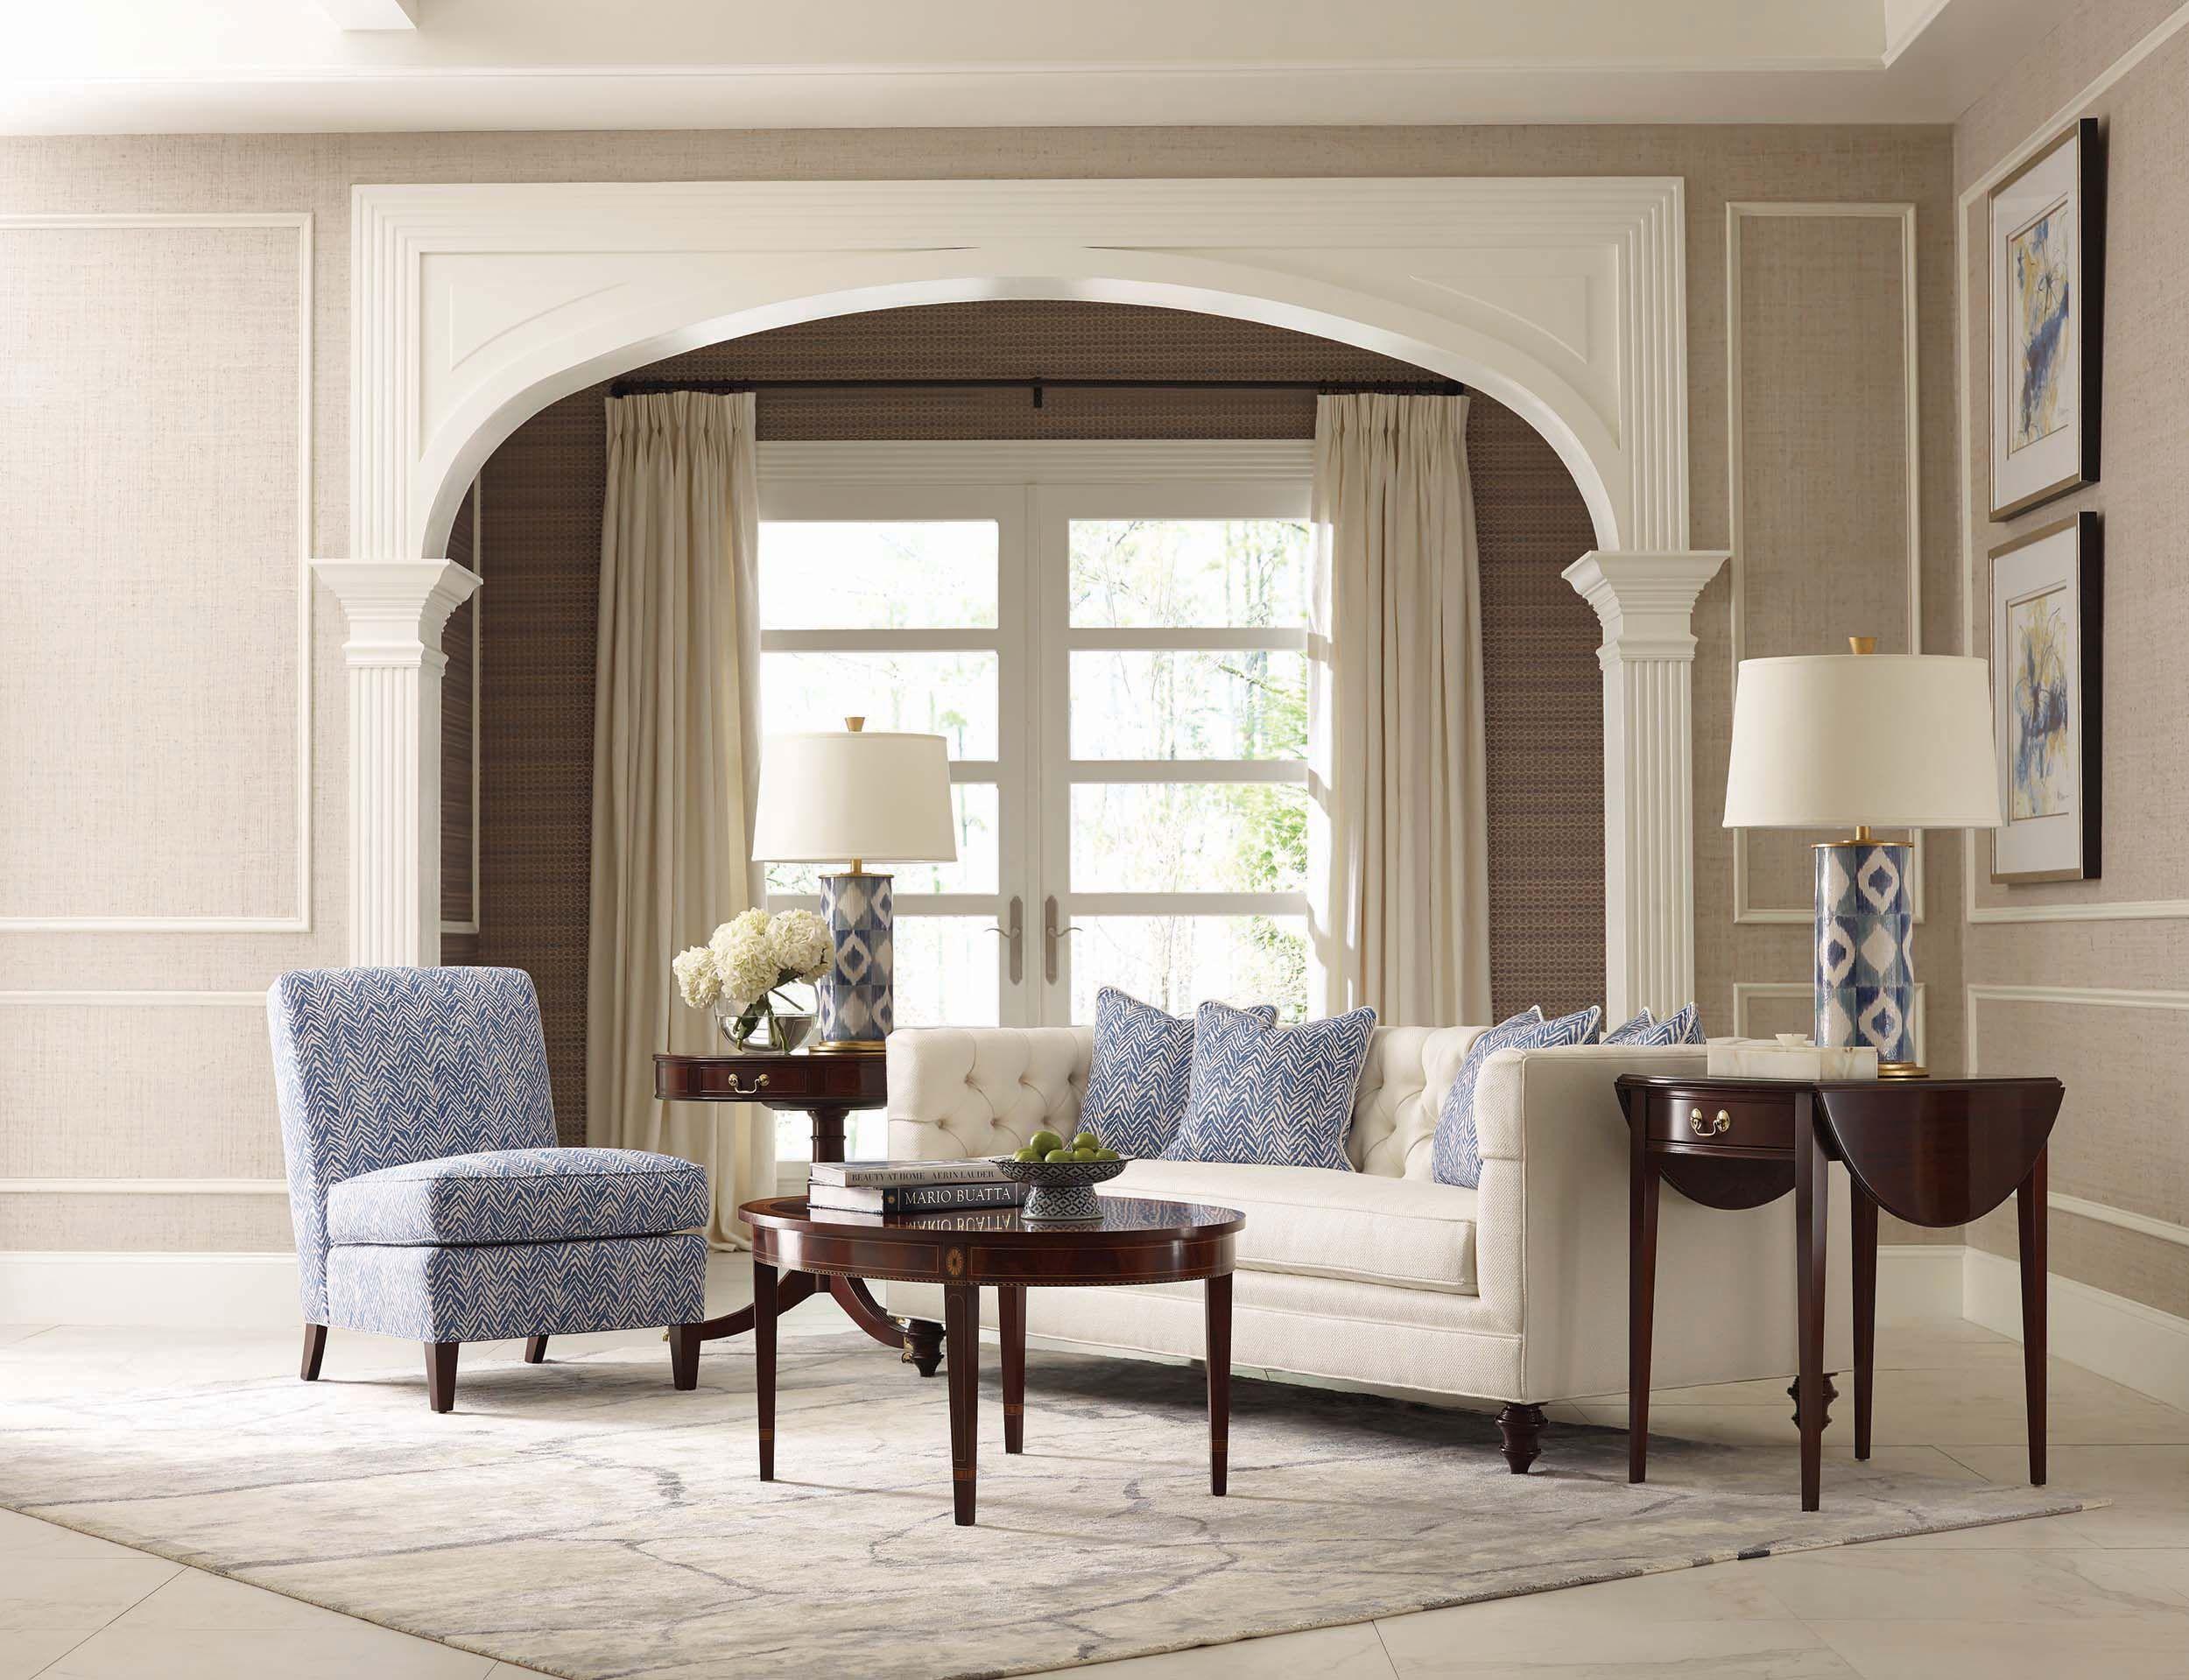 Stickley Furniture Brownstone Sofa